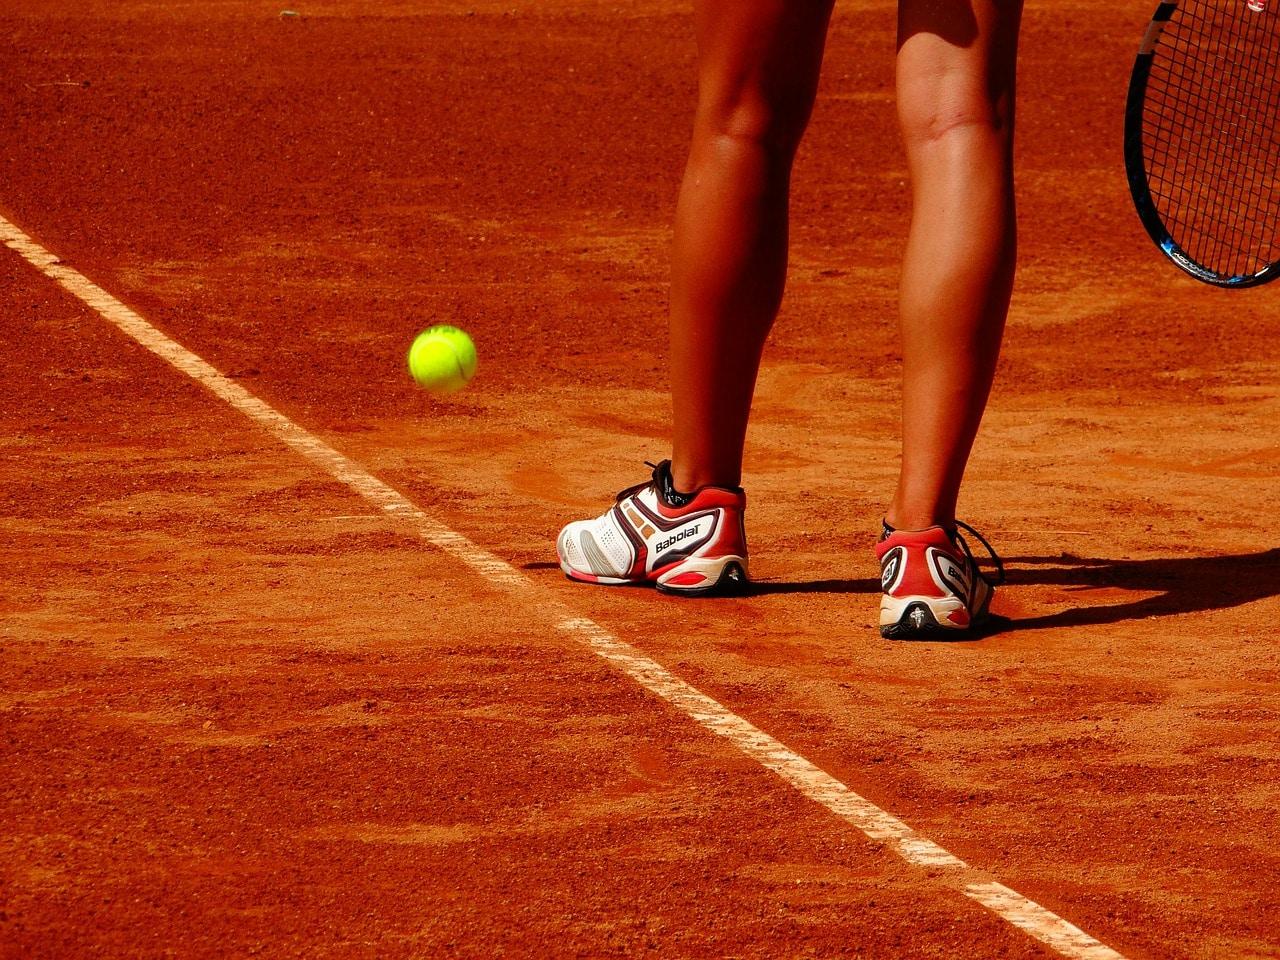 tennis-raquette-terre-battue